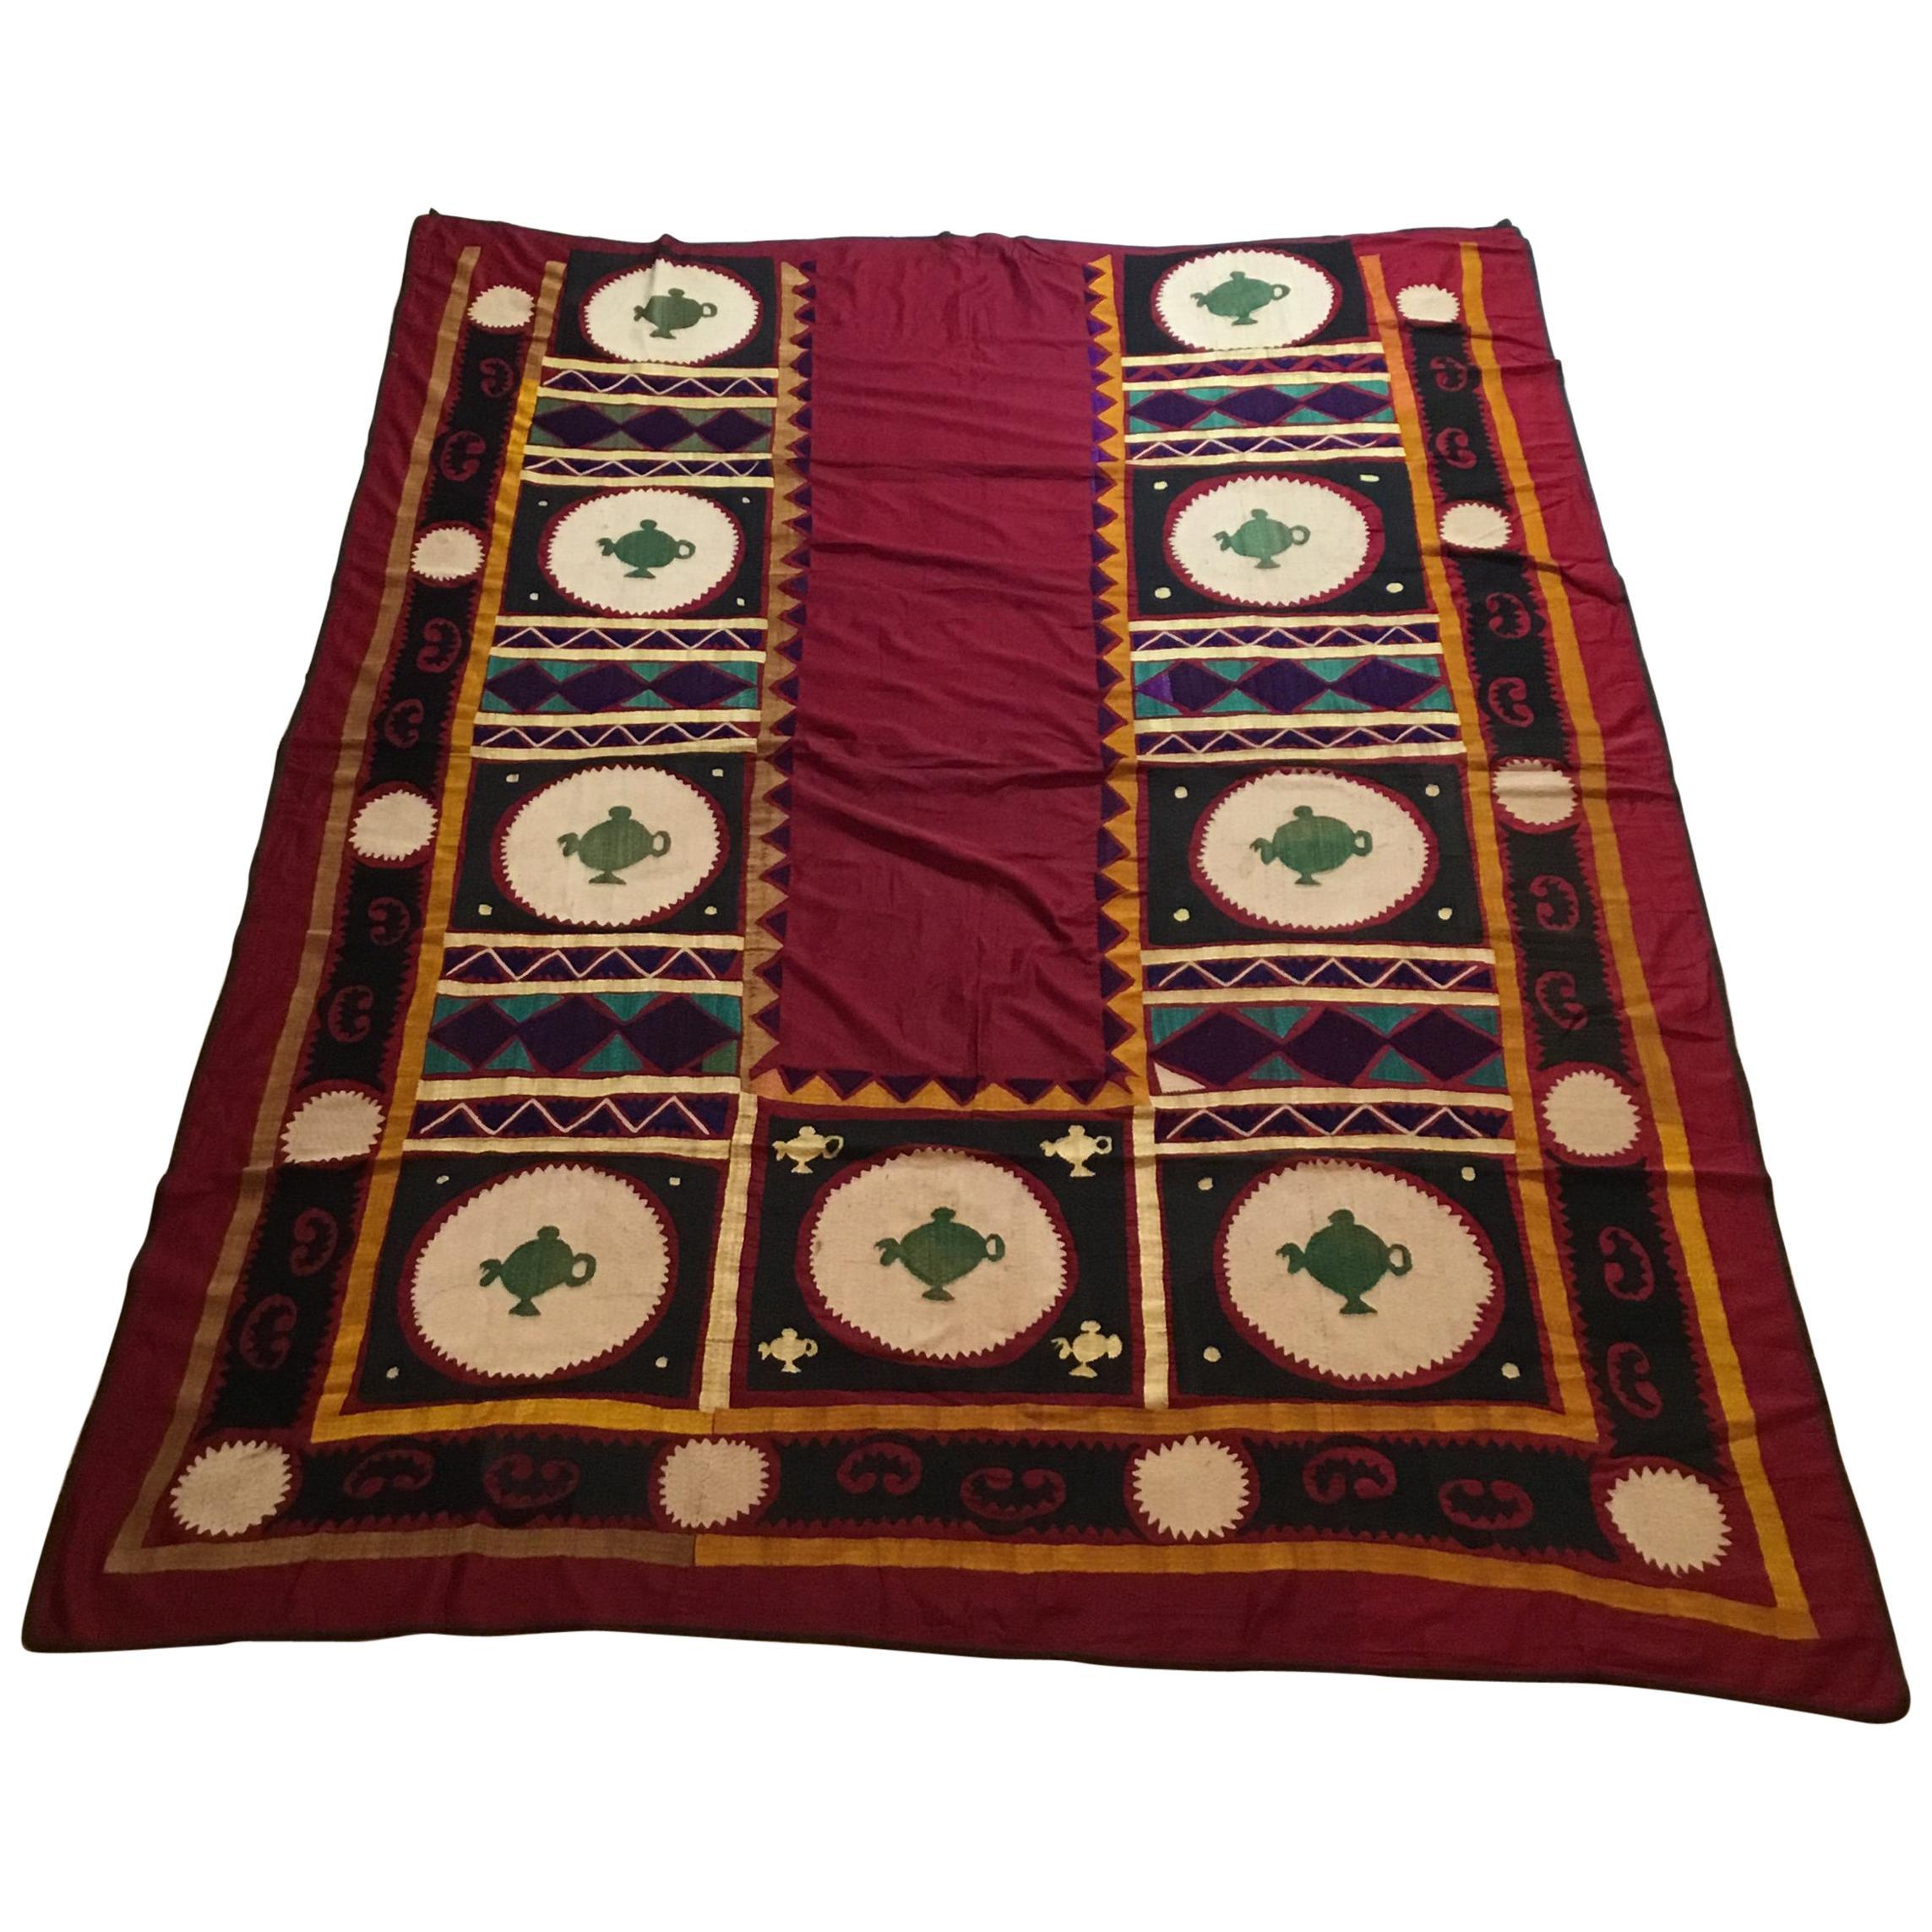 Vintage Embroidered Suzani Textile